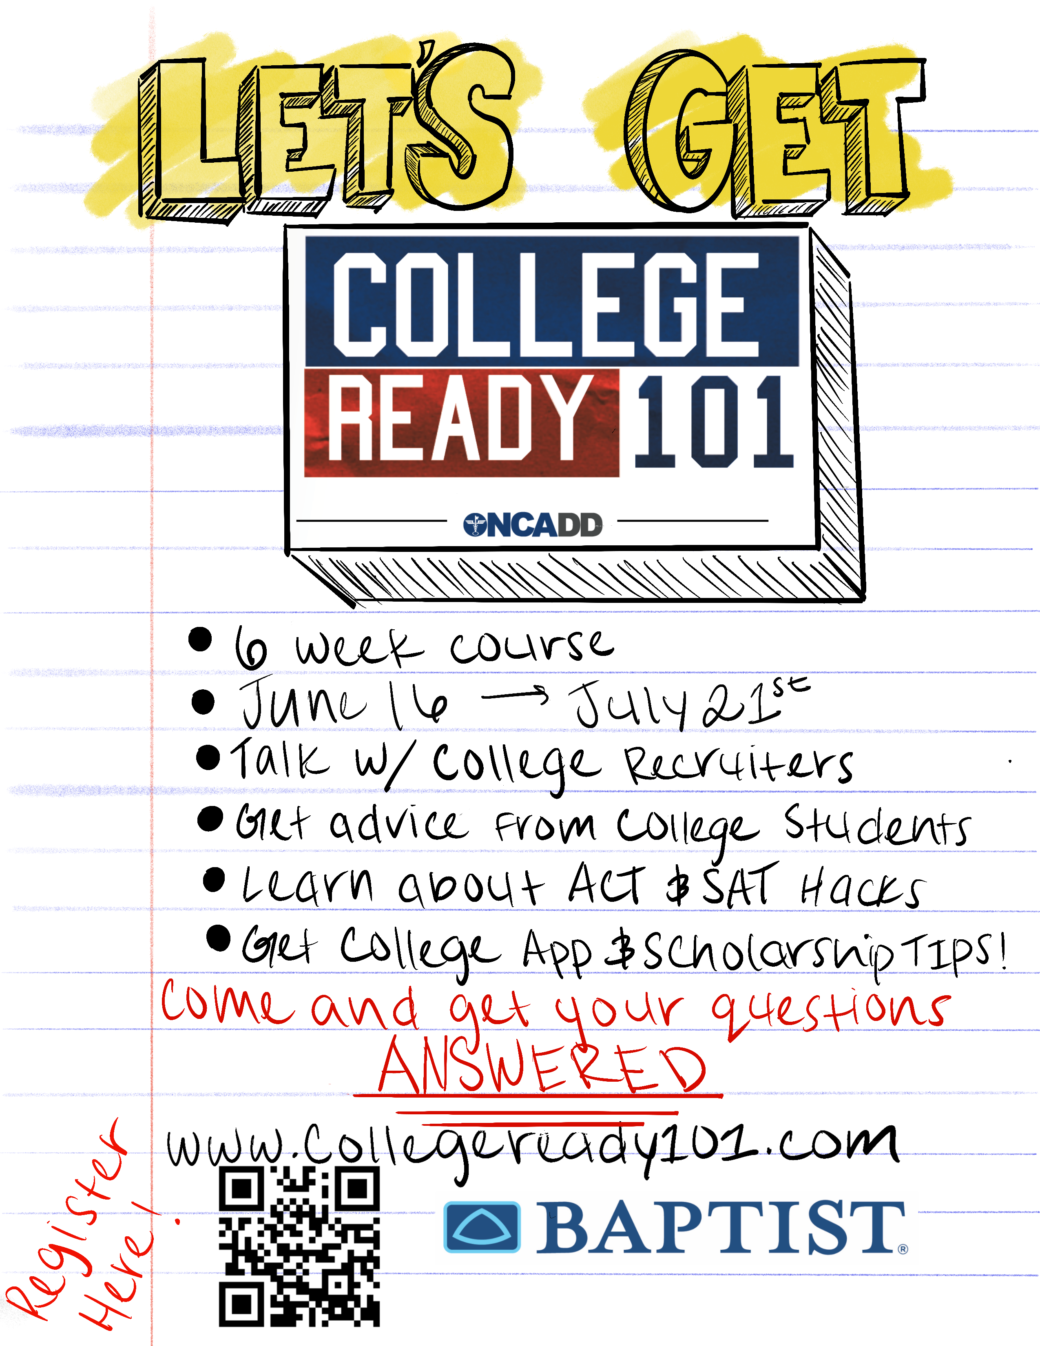 www.COLLEGEREADY101.com